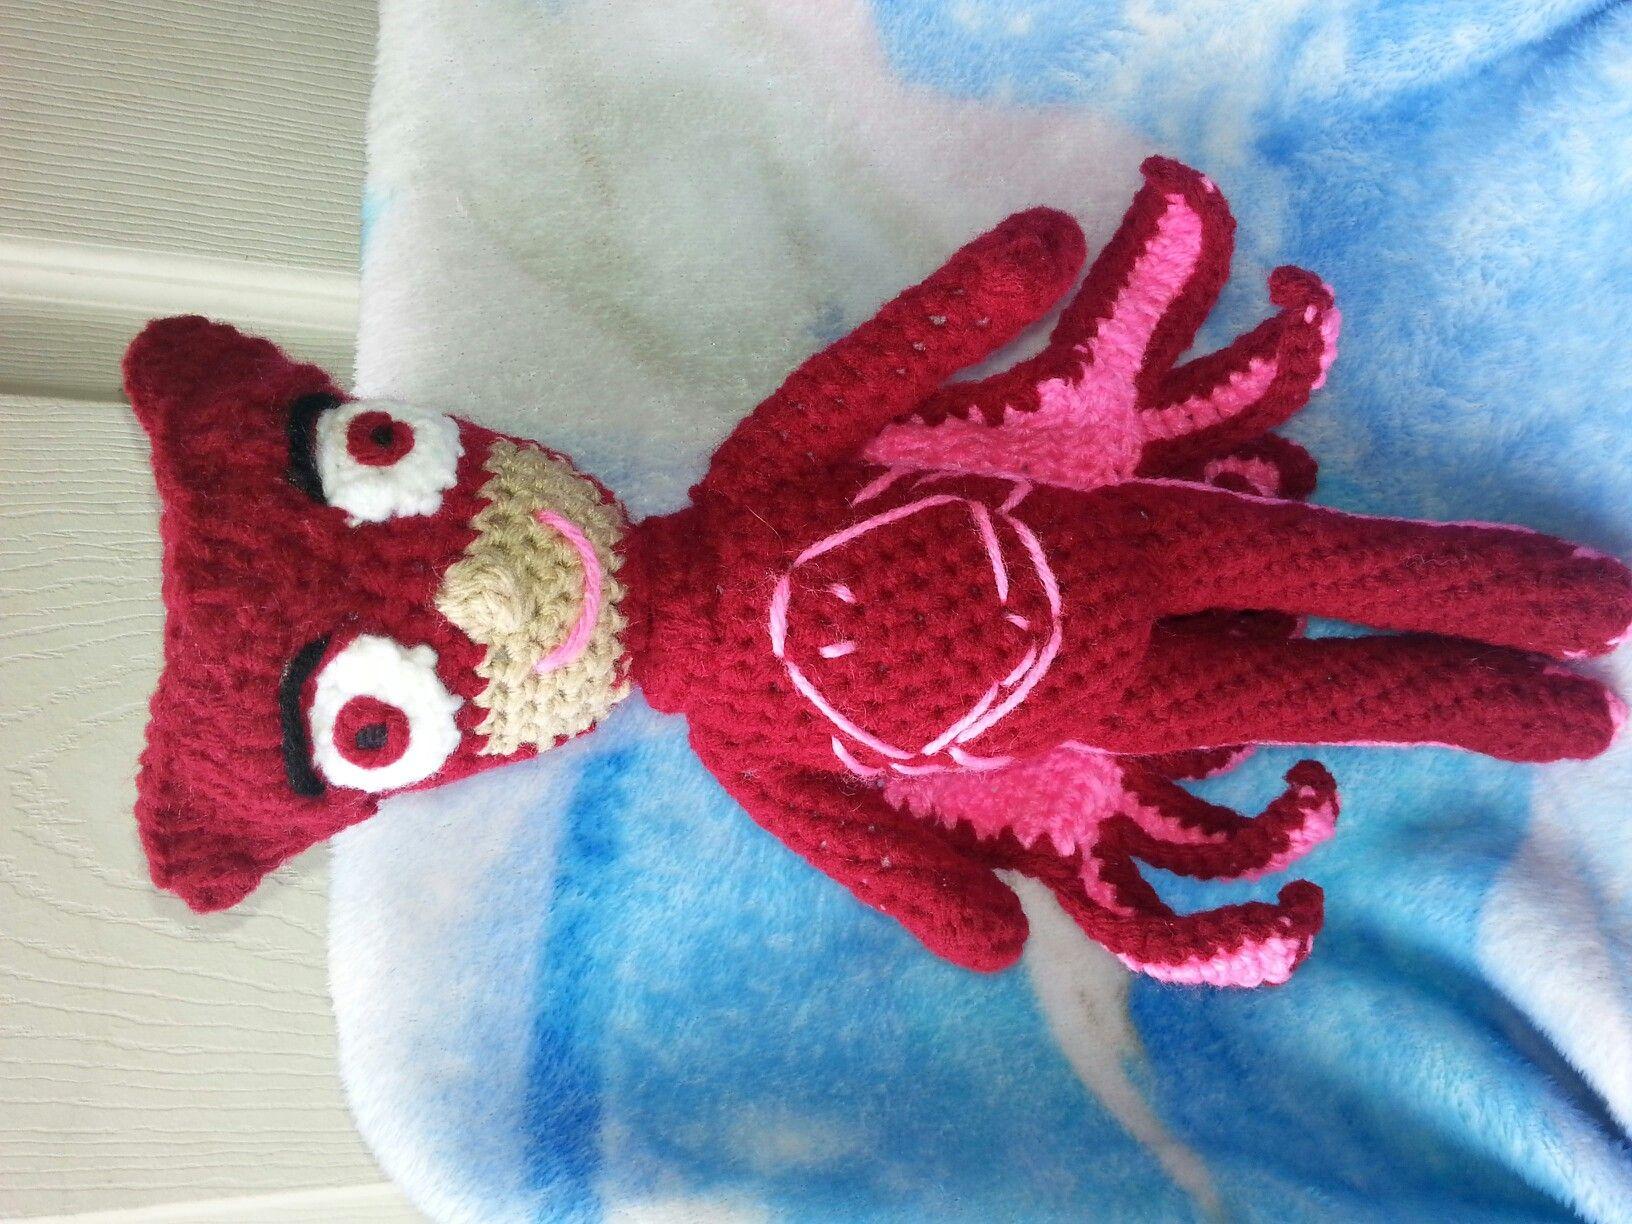 Amigurumi Oso Pijama : Pj masks inspired doll héroes en pijamas crochet